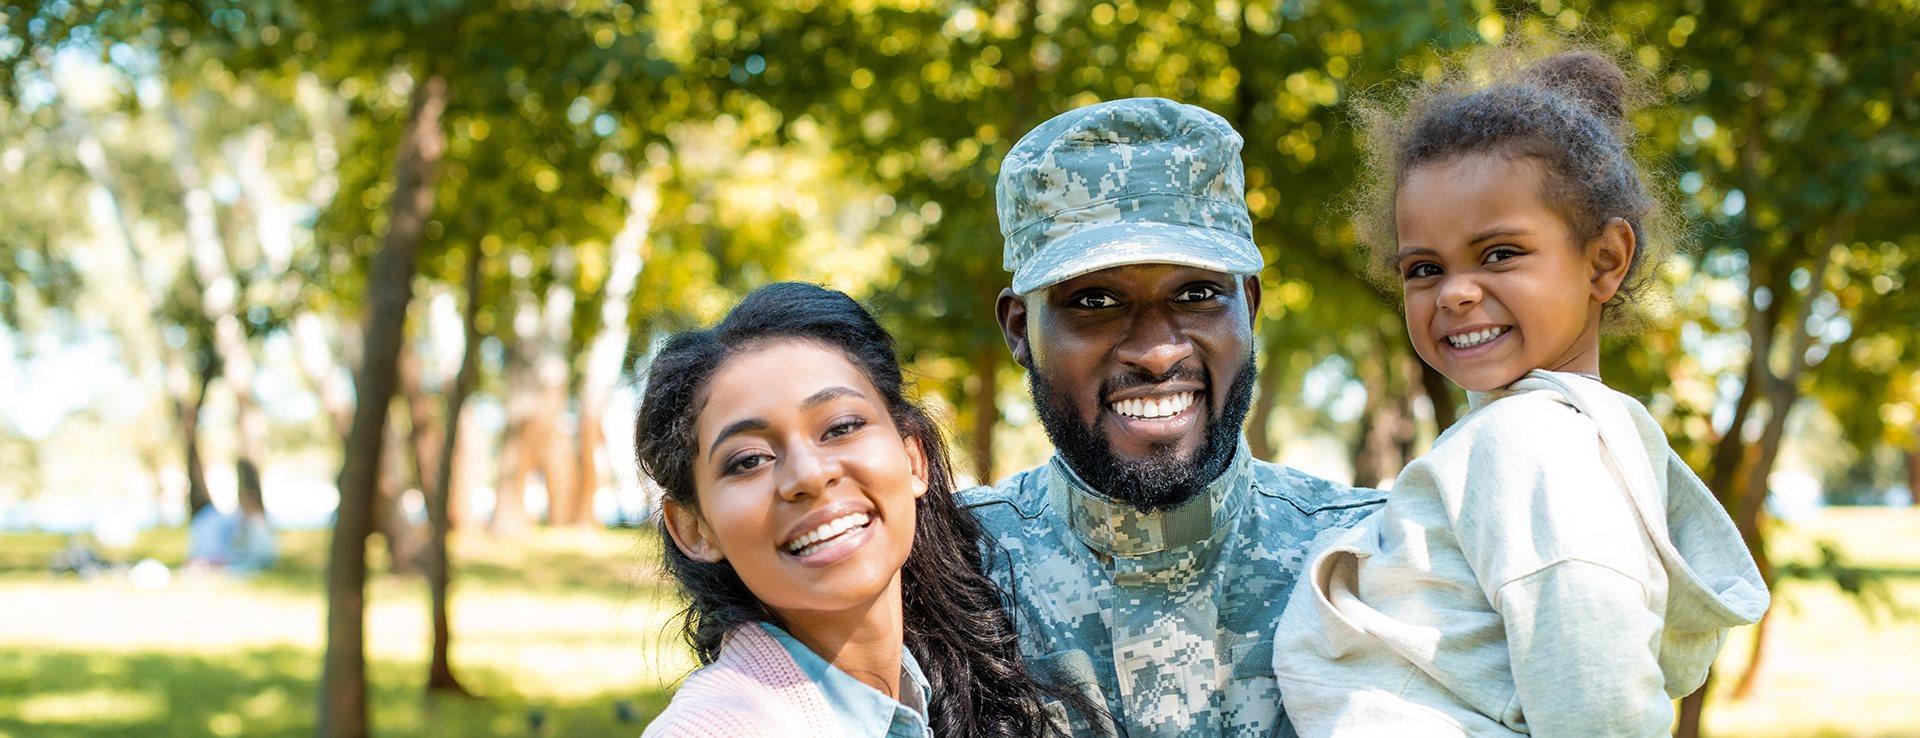 Military Families | Summerlyn Apts in Killeen, TX